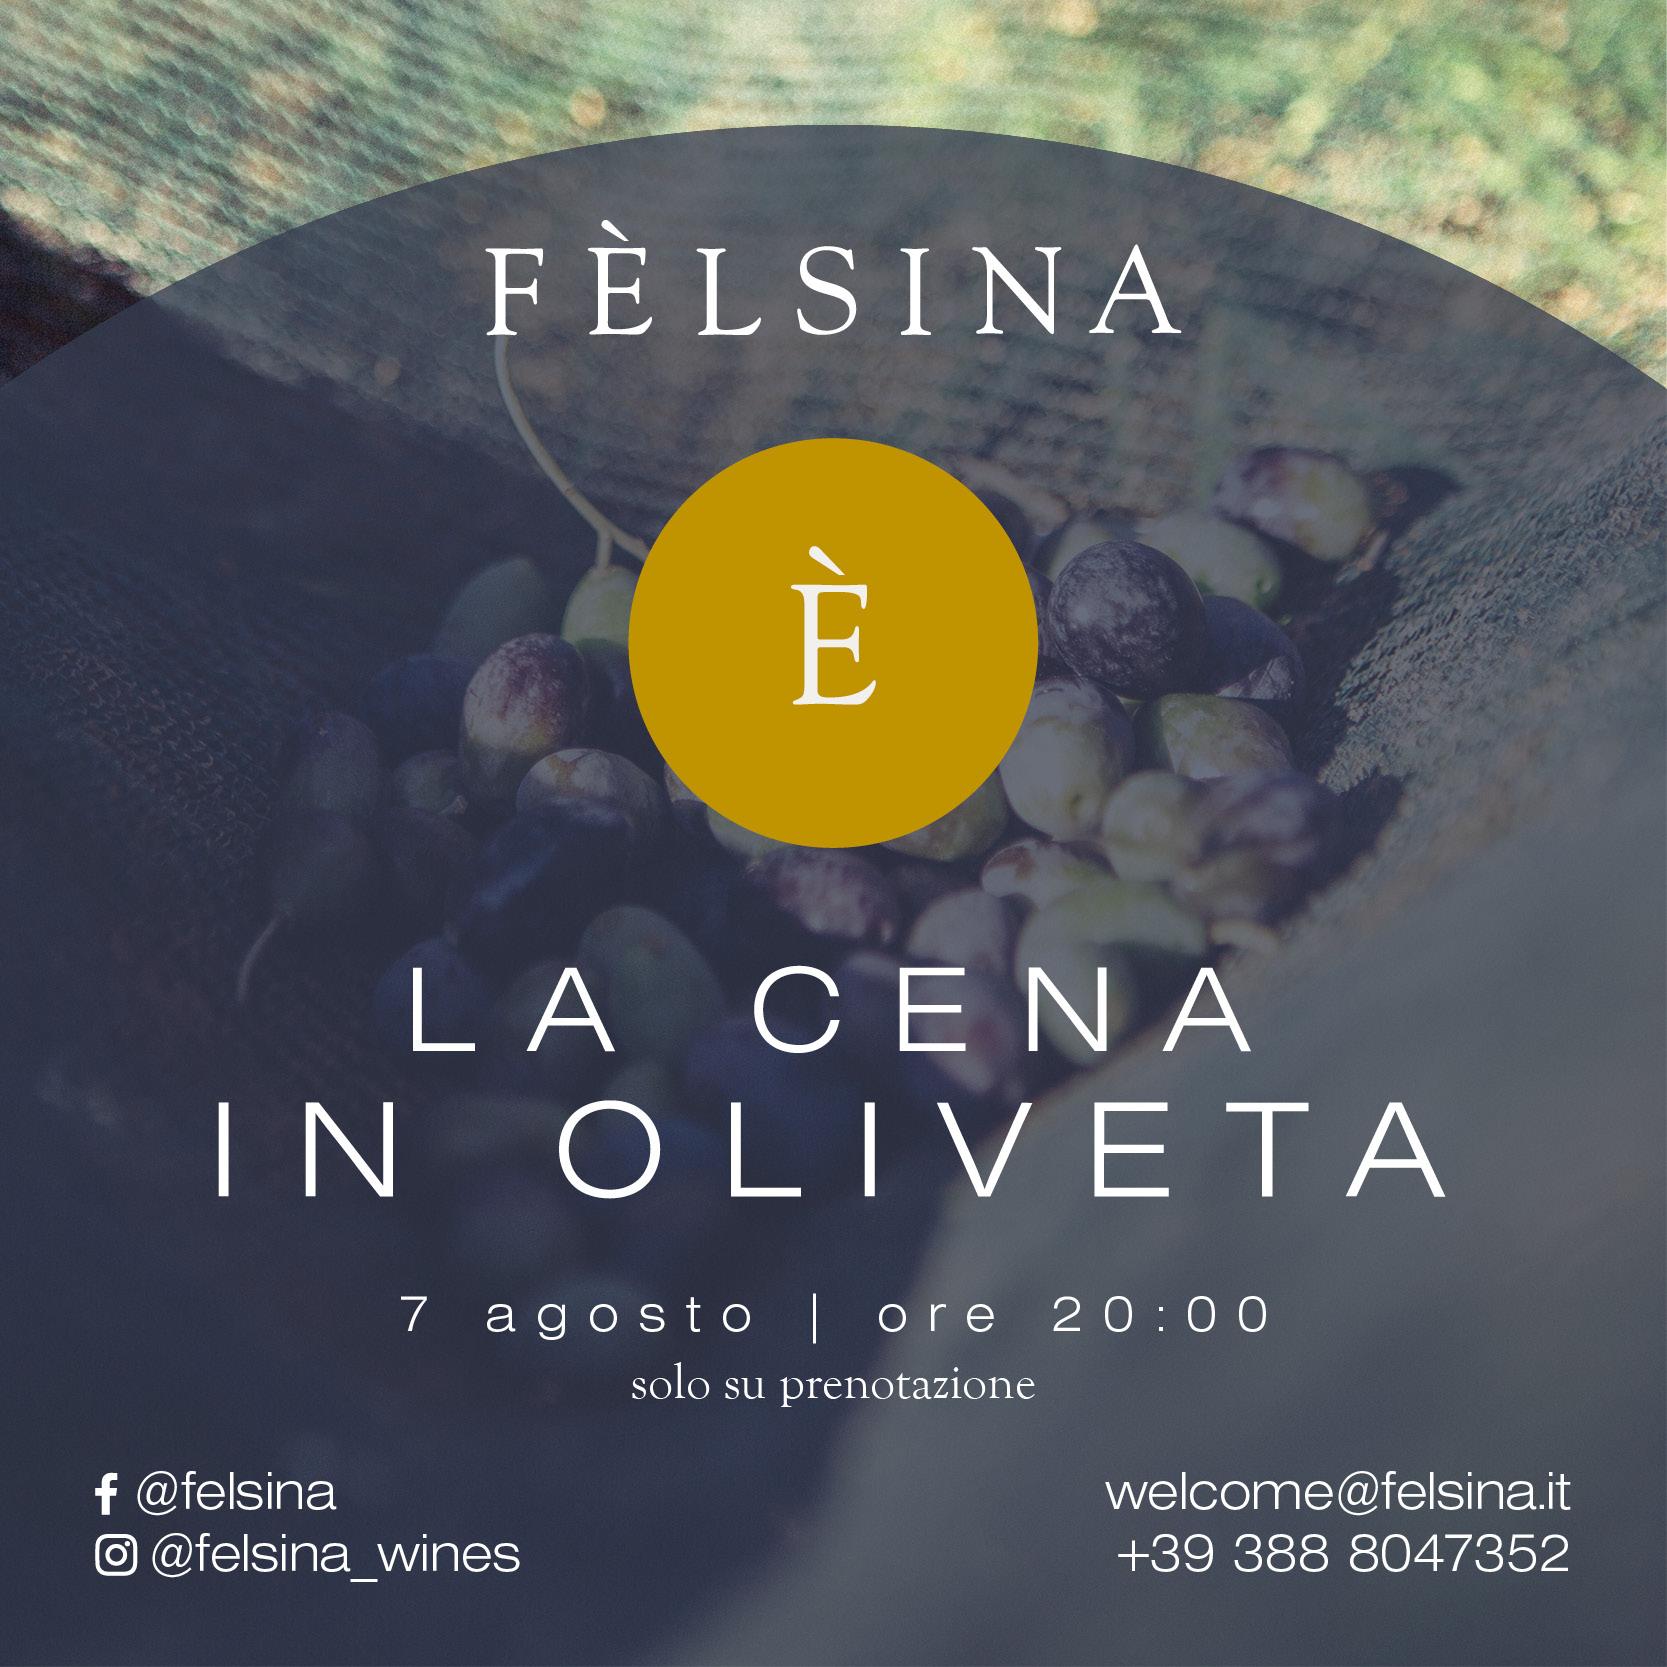 felsina_post_2021_eventi8